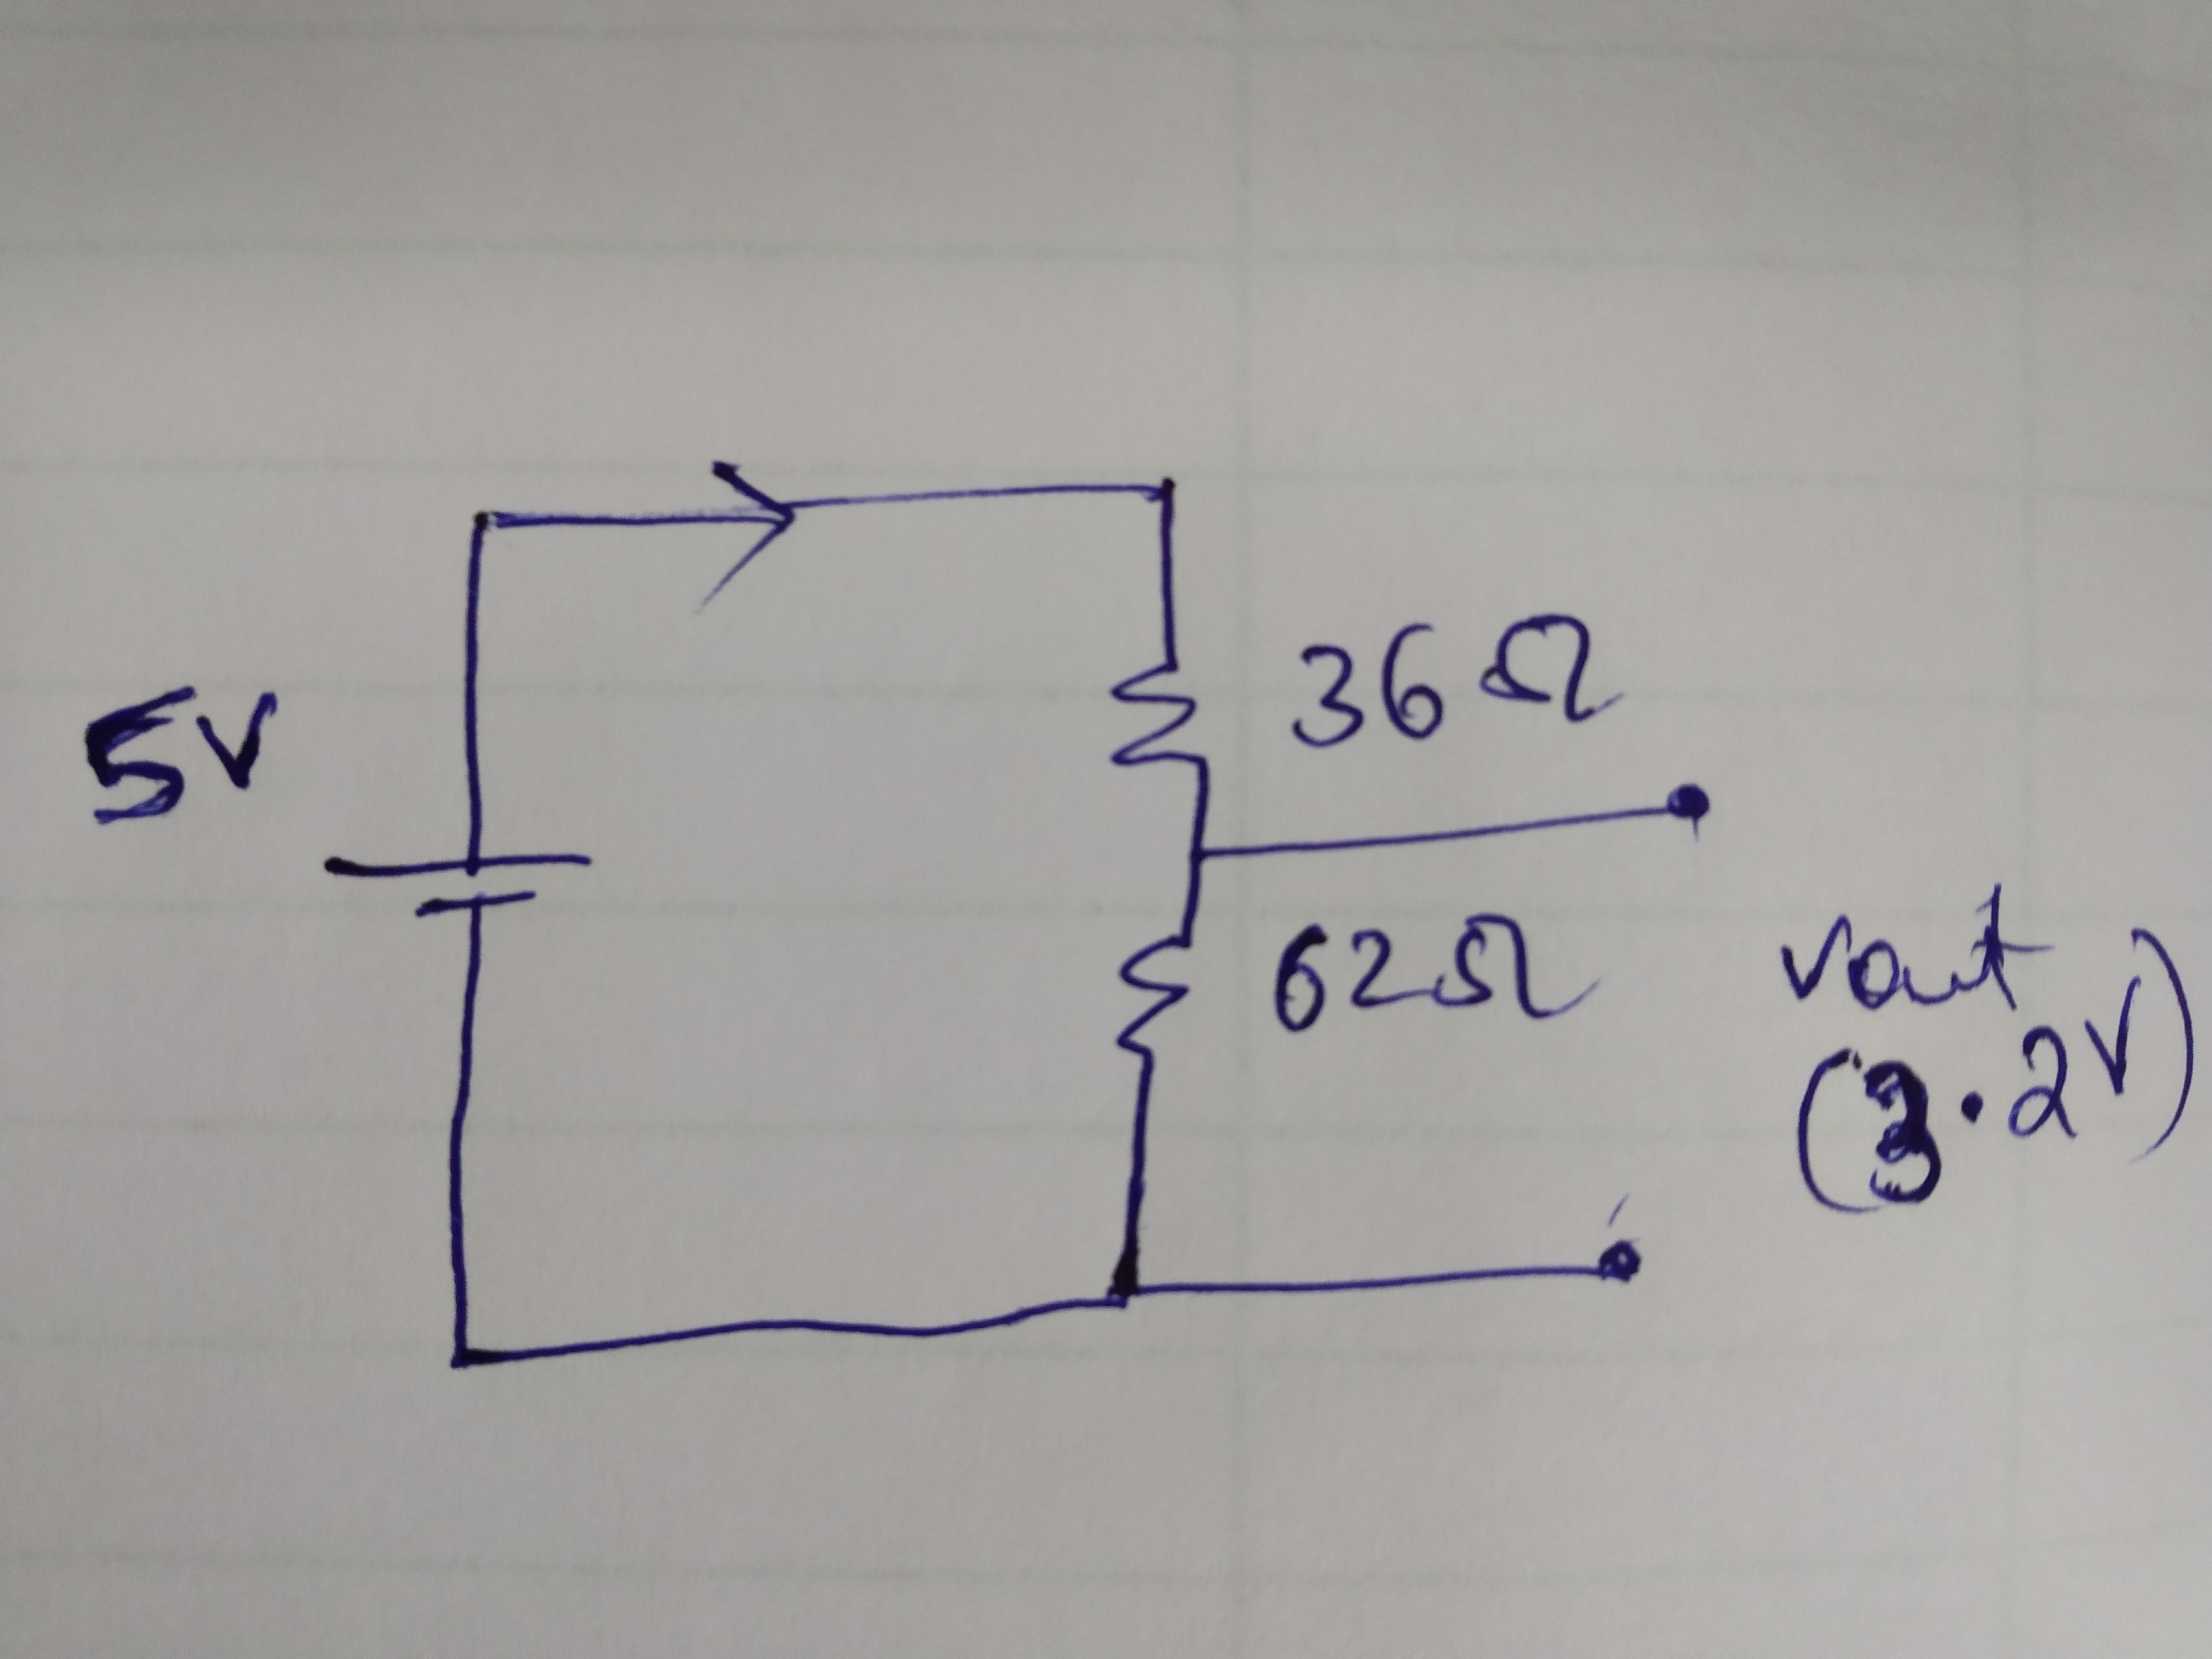 Interfacing TDC7200EVM with arduino and Kintex Ultrascale